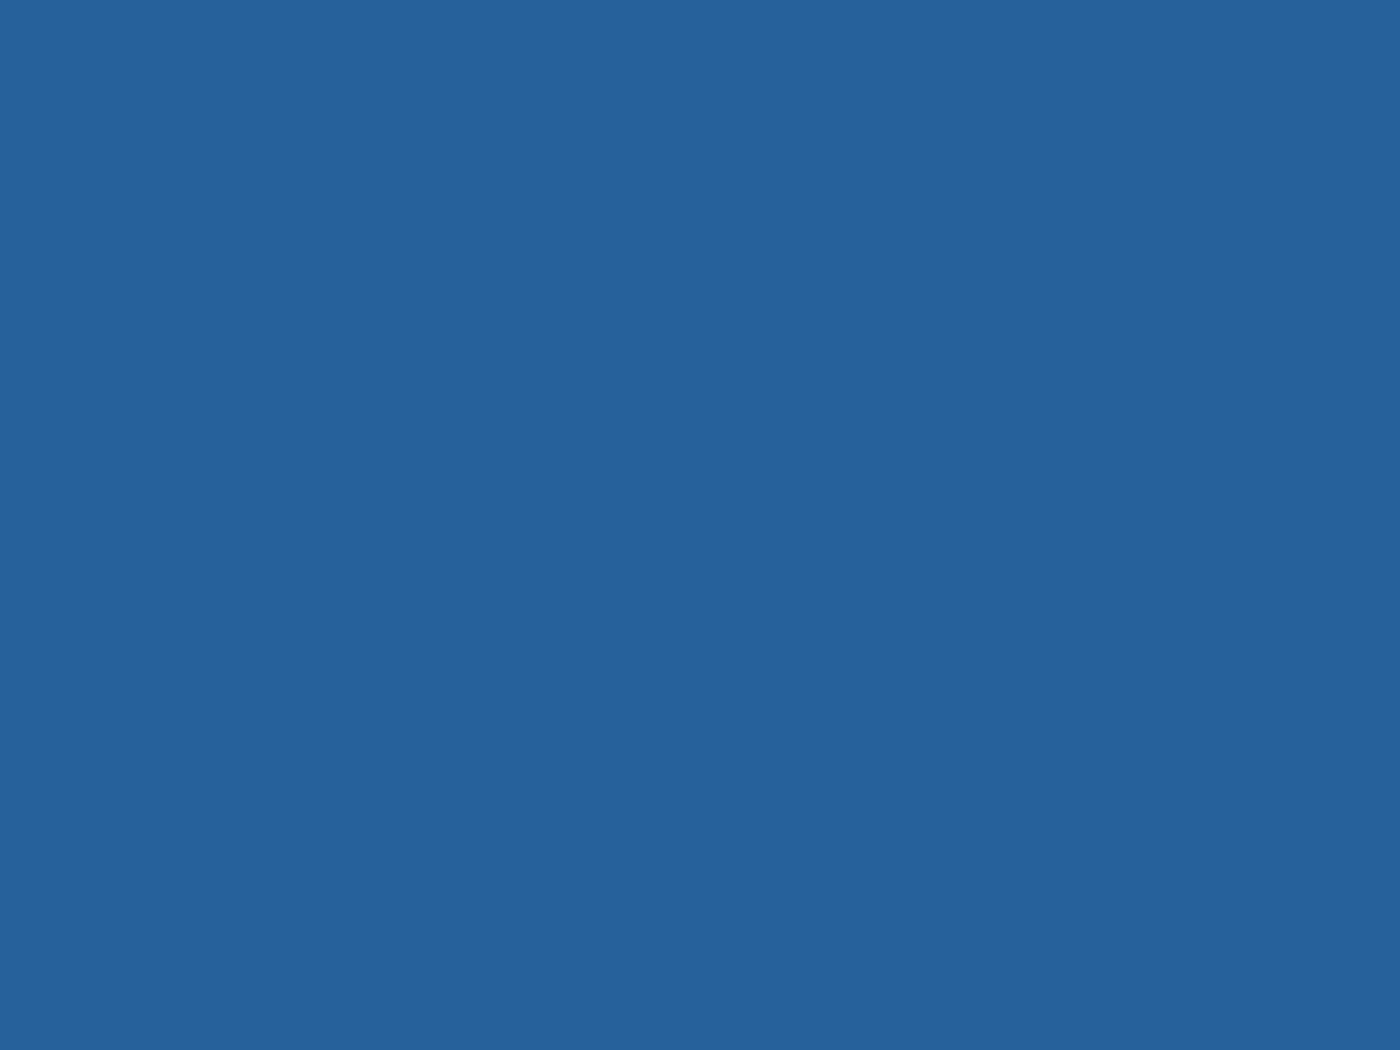 1400x1050 Lapis Lazuli Solid Color Background